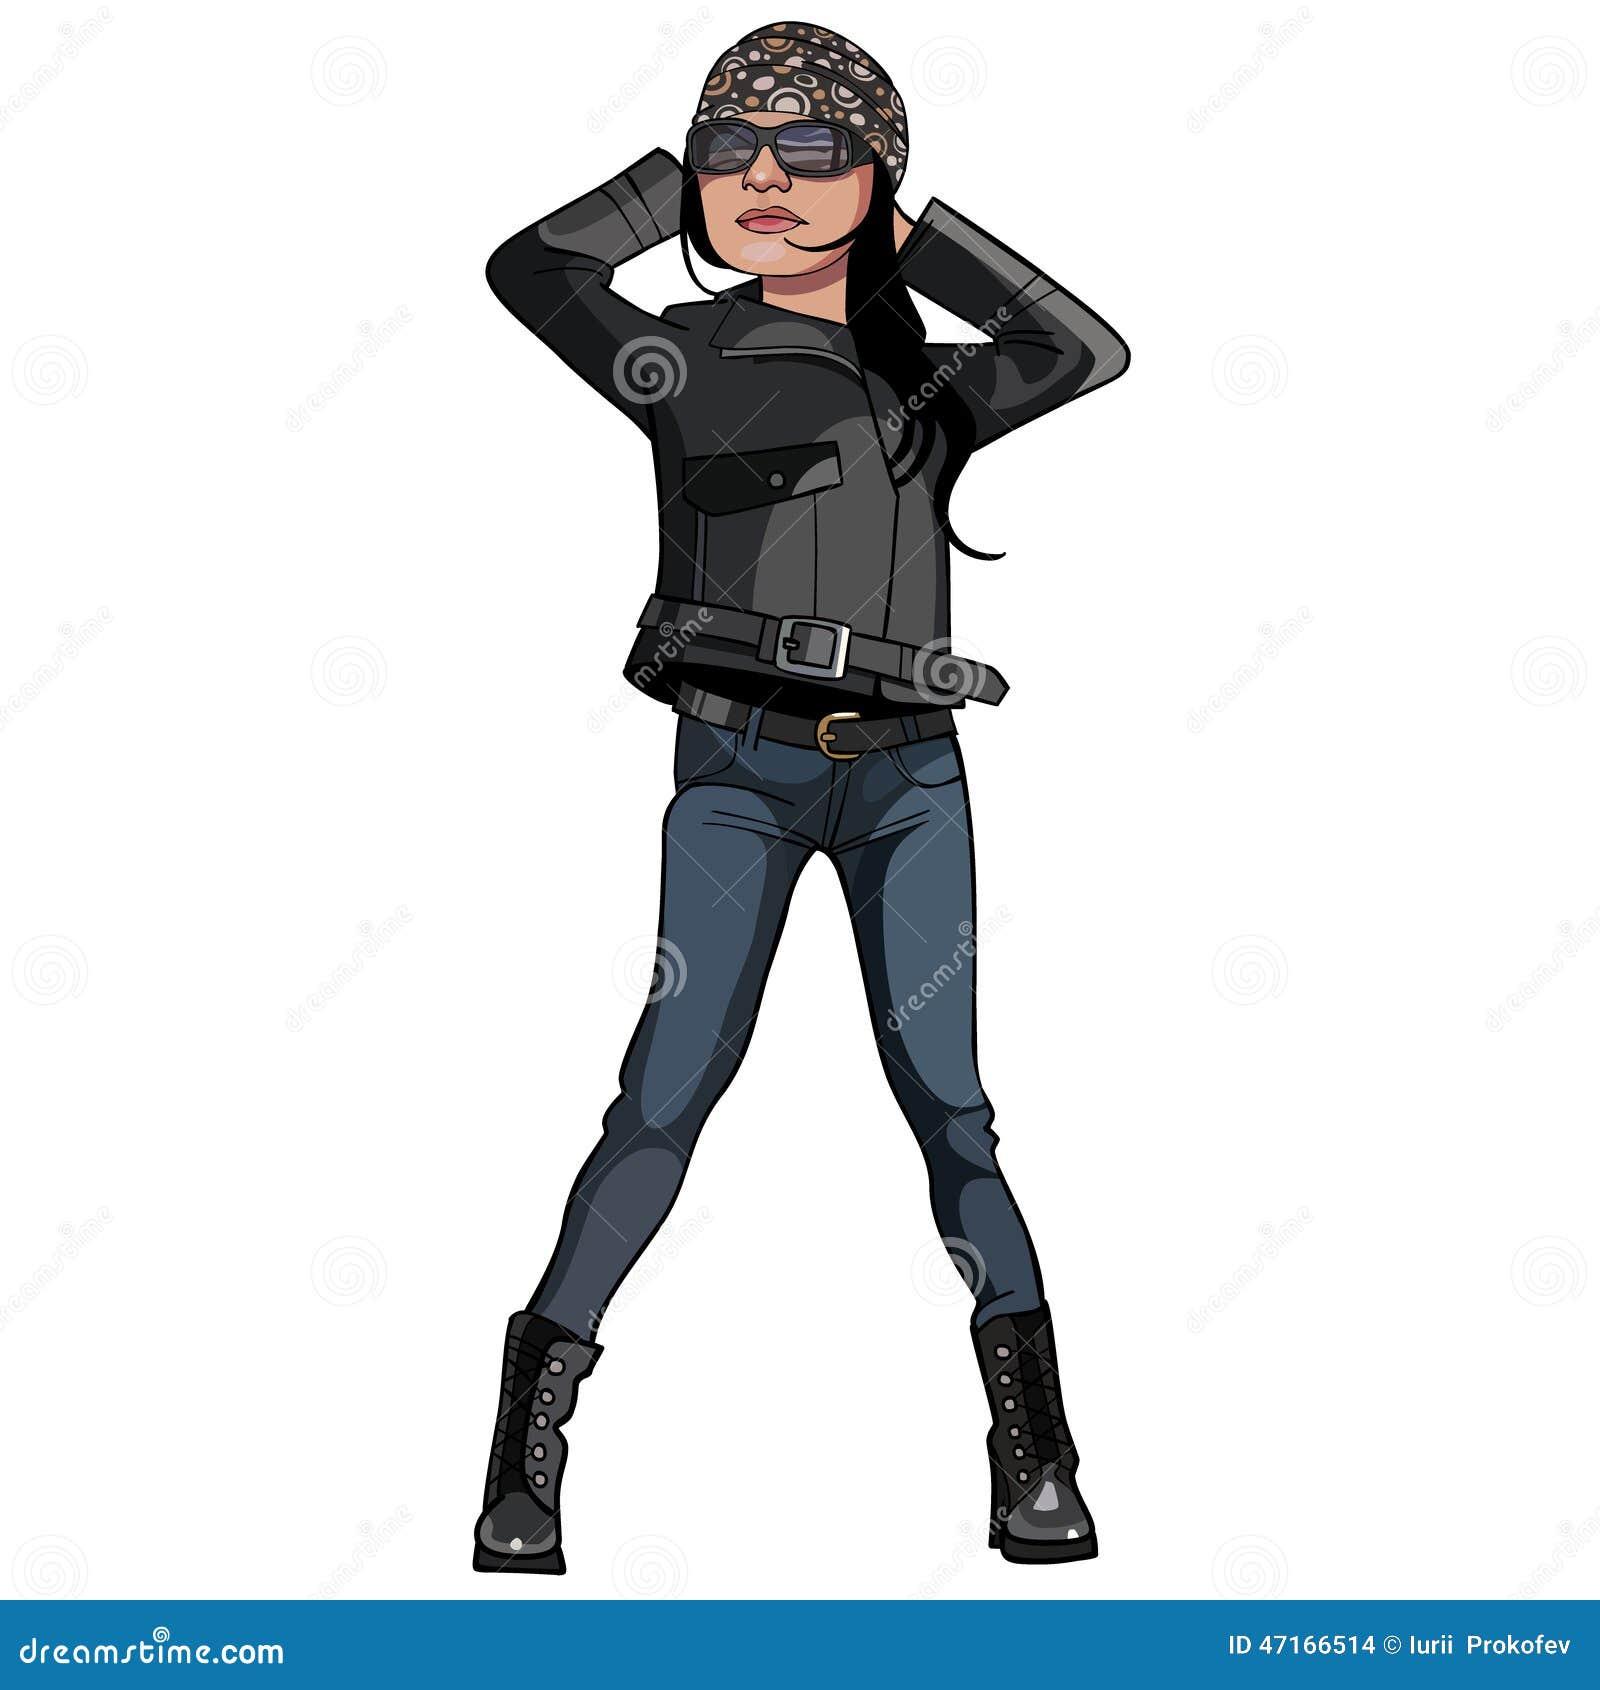 Cartoon girl wearing biker